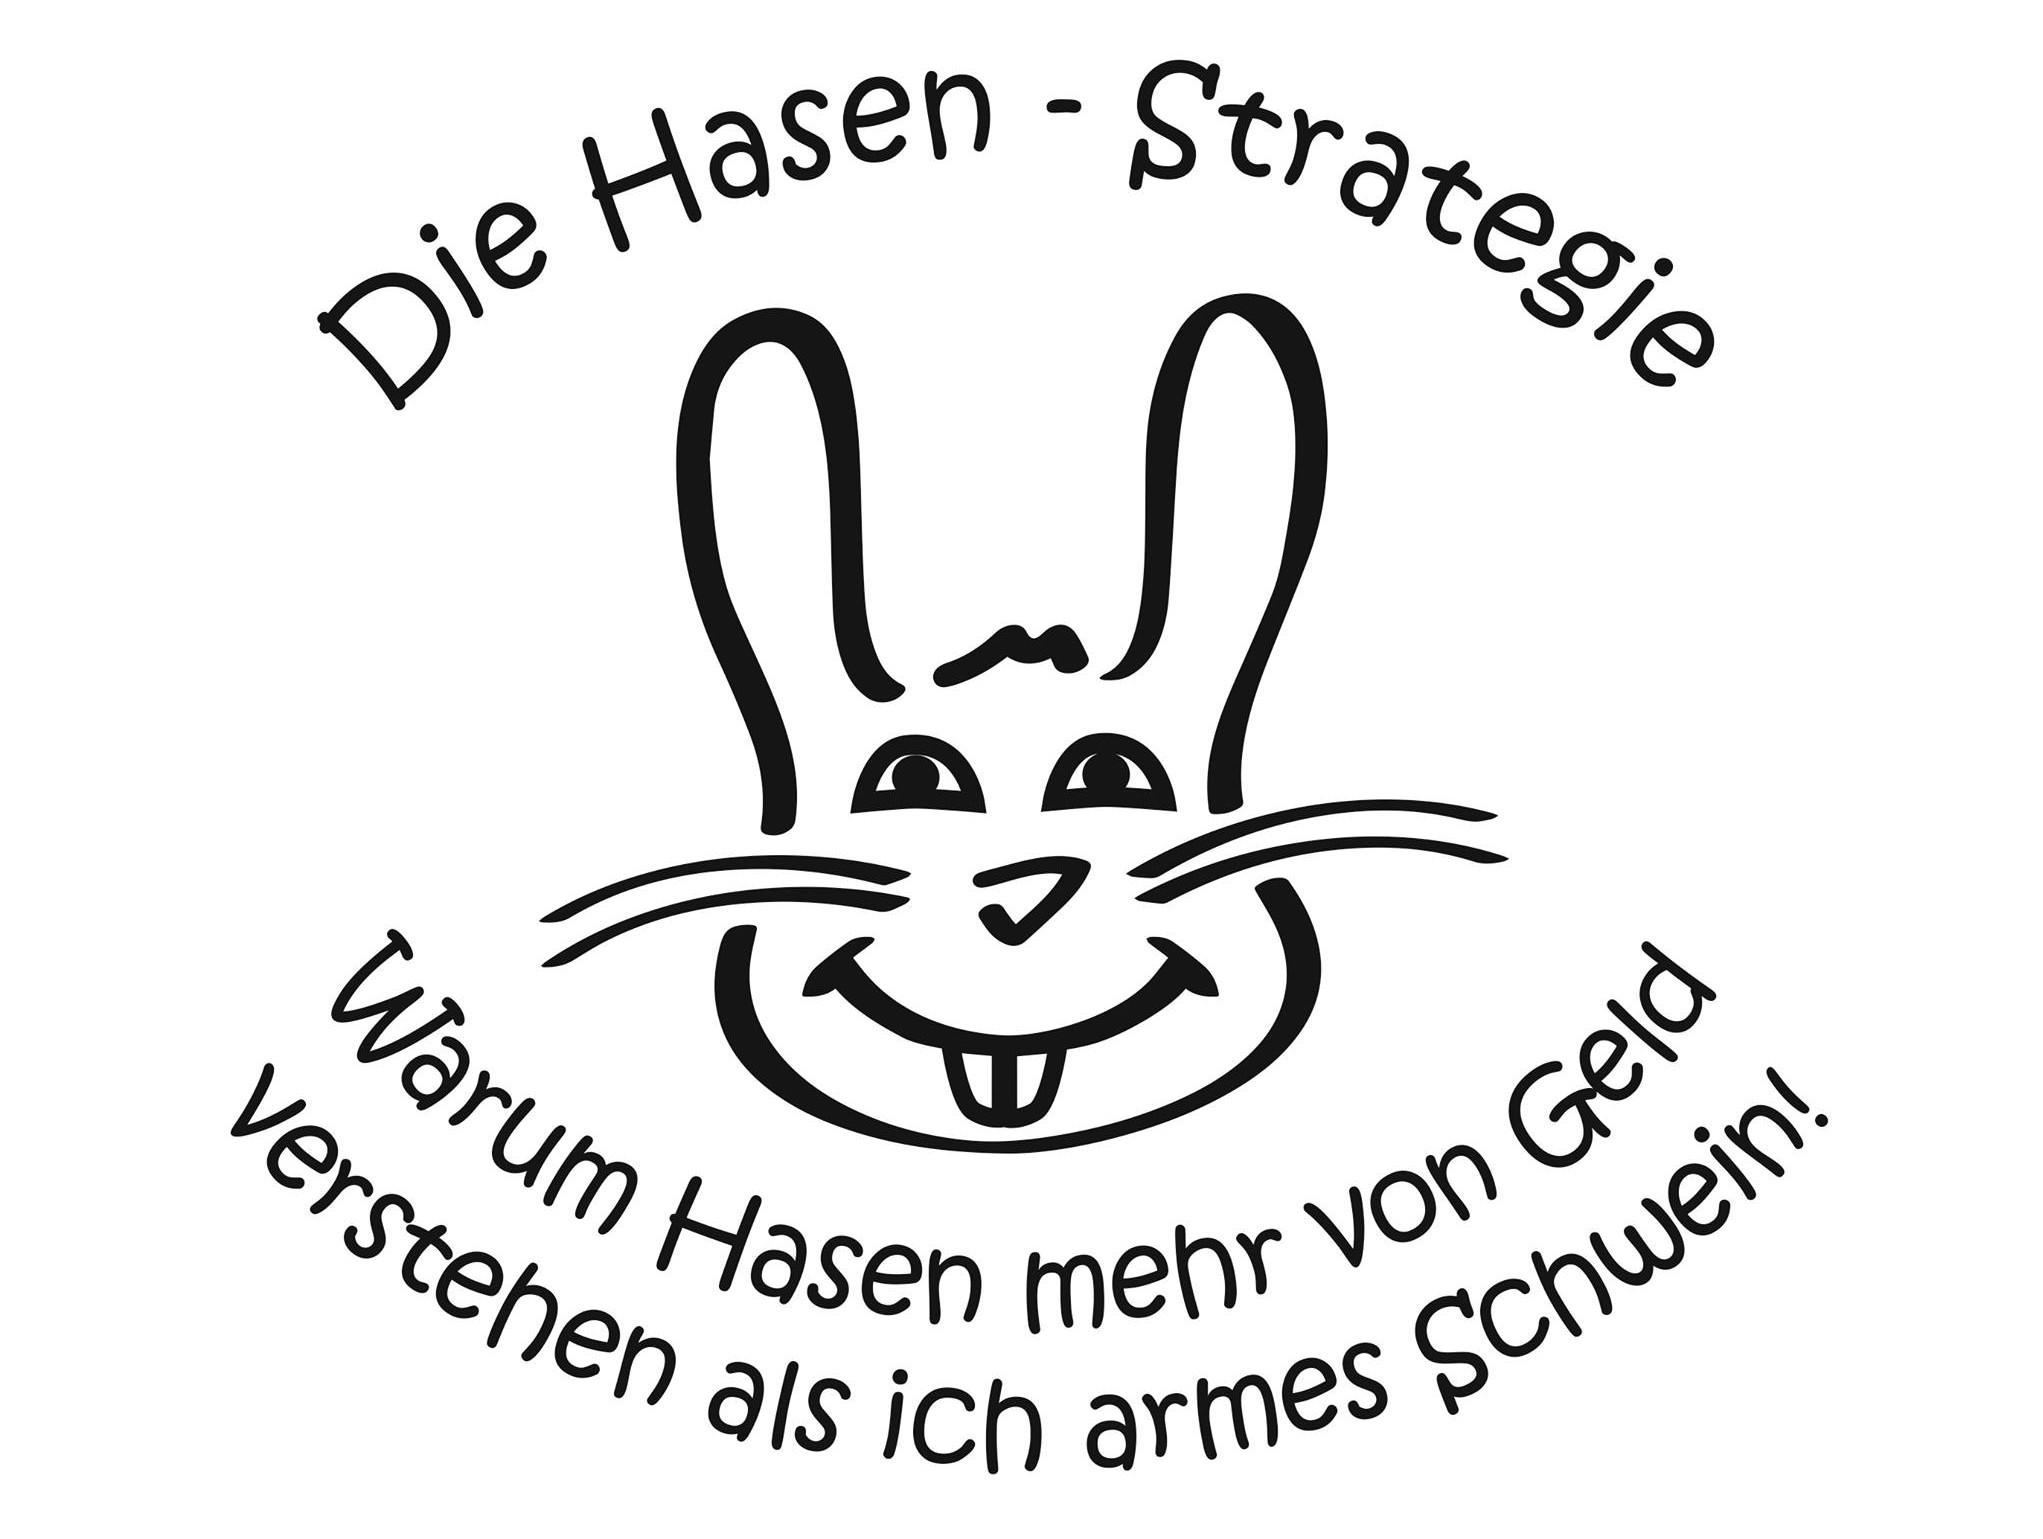 Hasenstrategie-Logo-18112014-Text